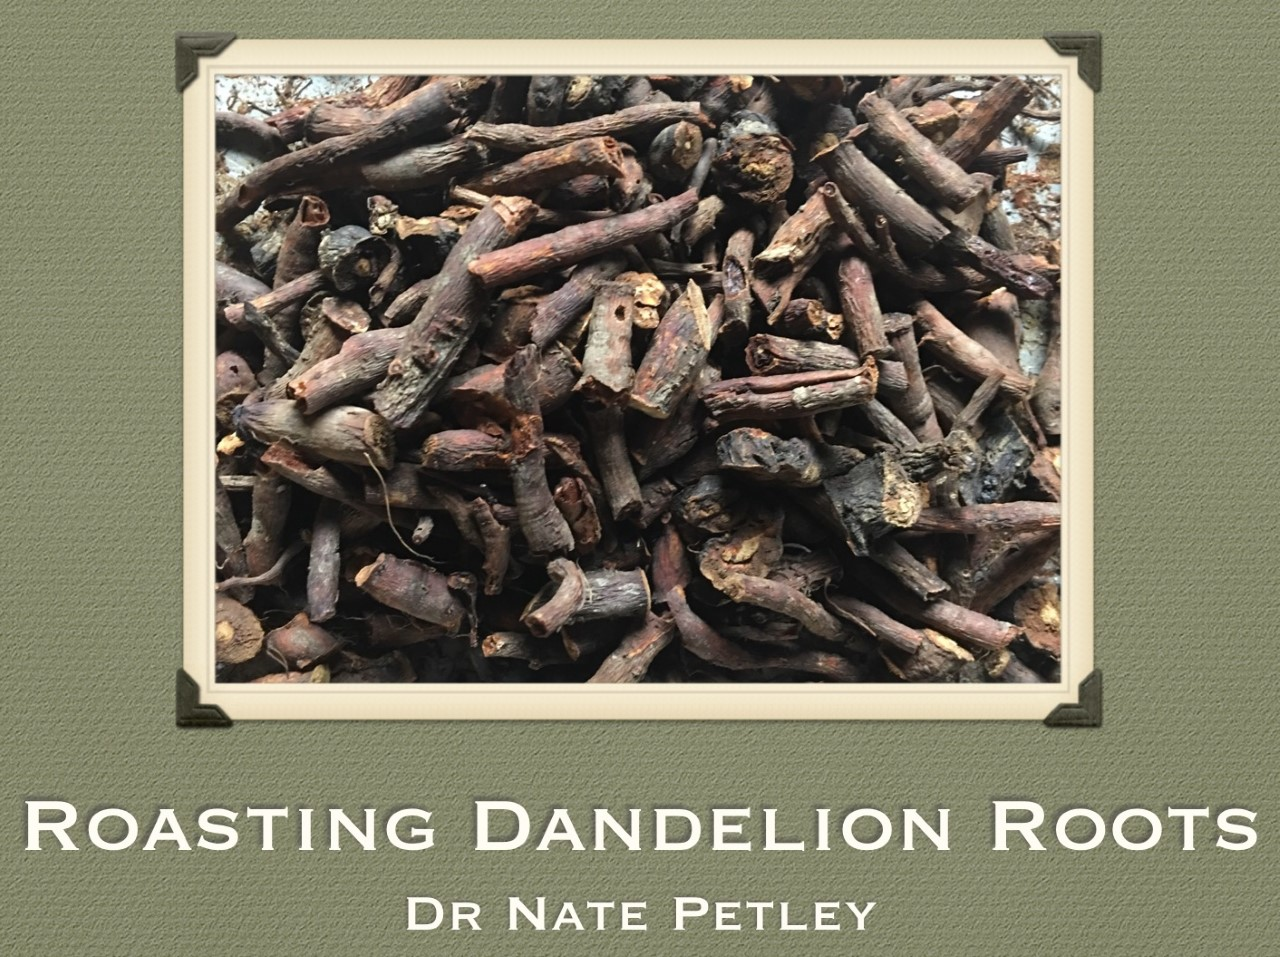 Roasted Dandelion Root Tea (Part 2)